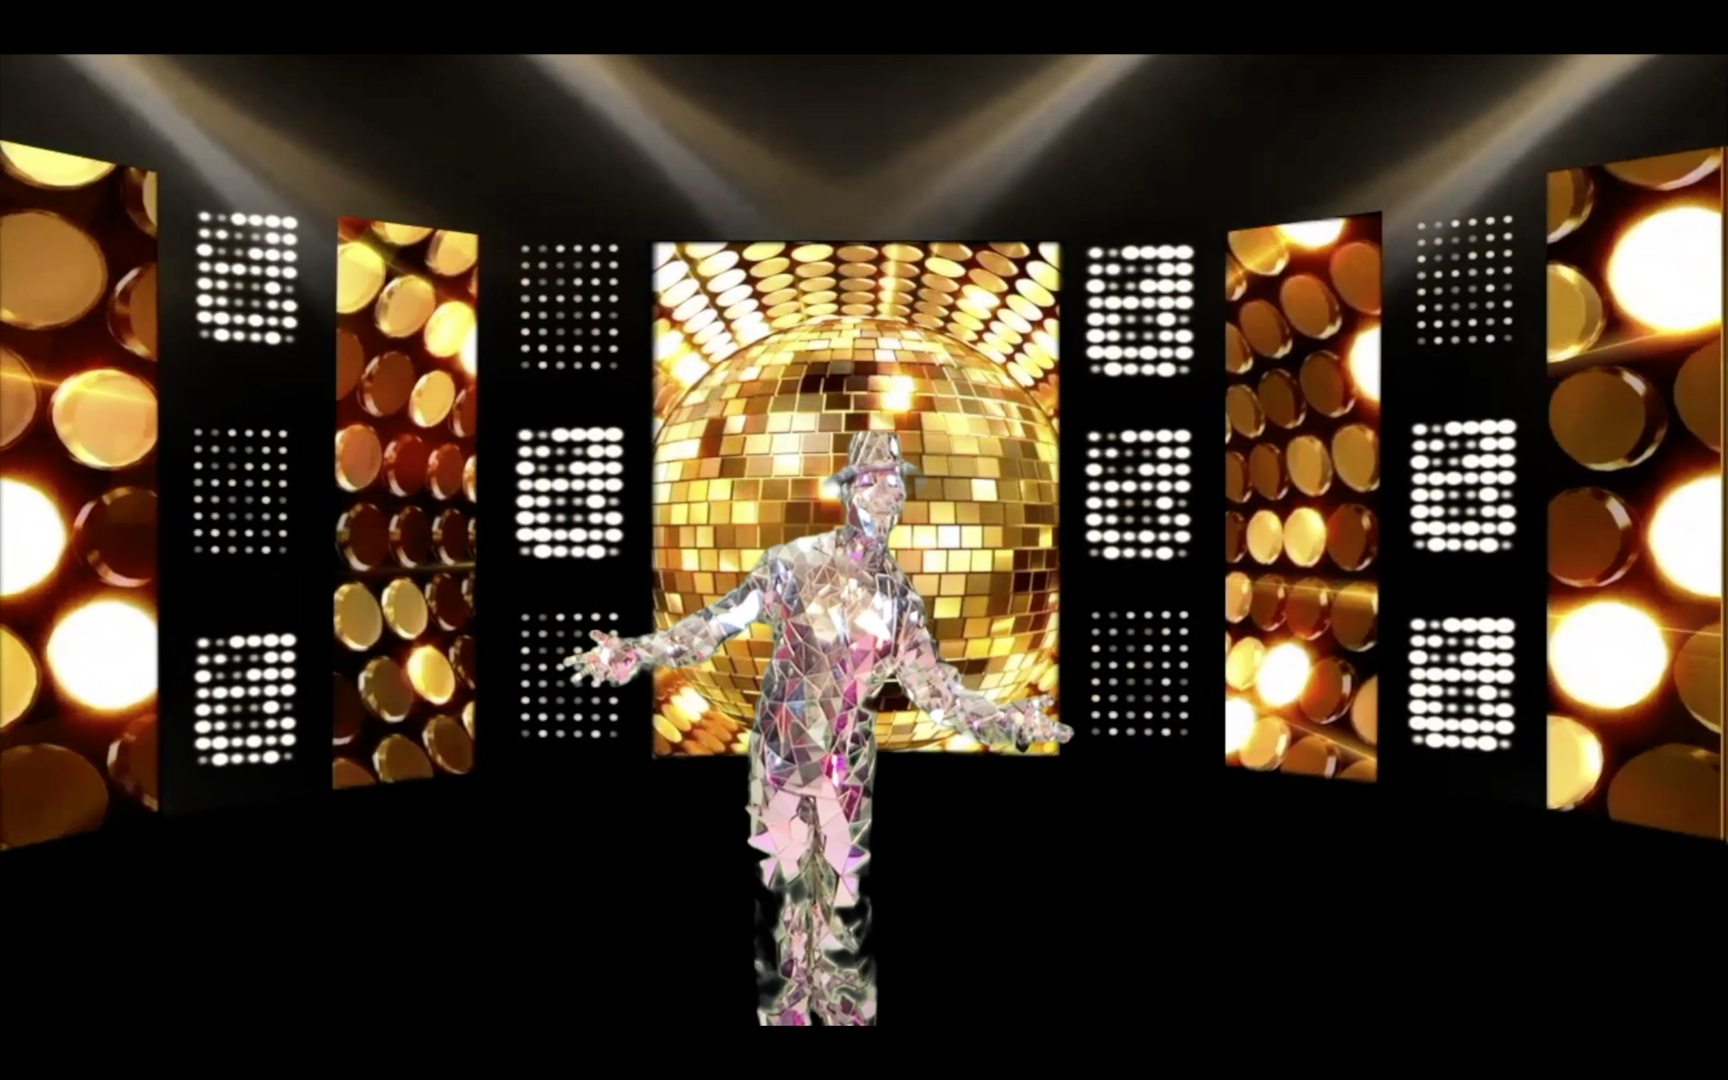 virtual mirror man